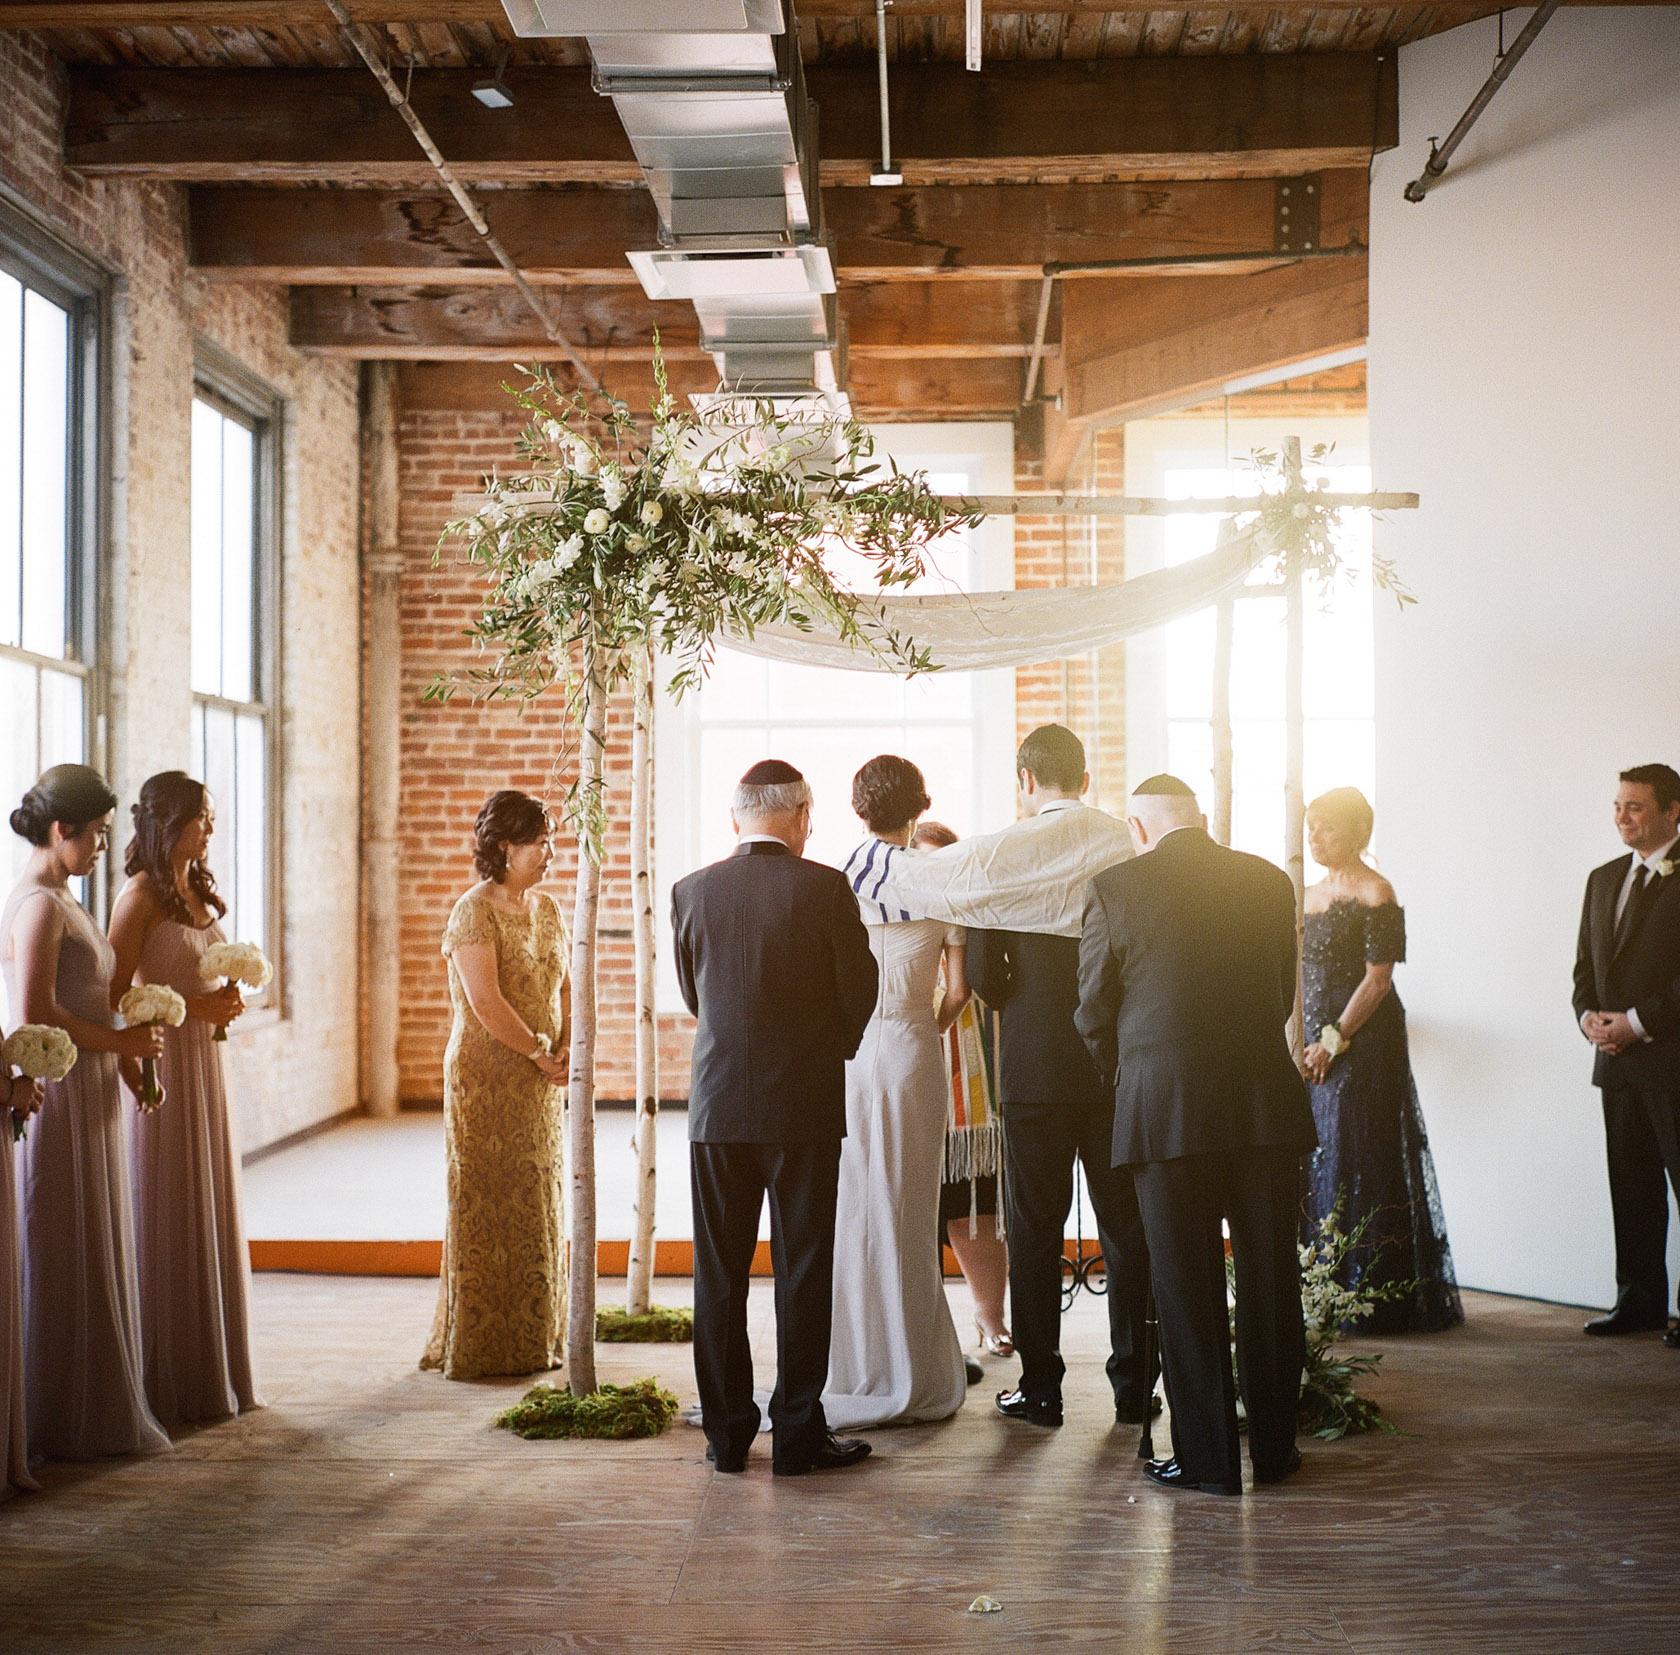 New Orleans Weddings: Contemporary Arts Center Wedding